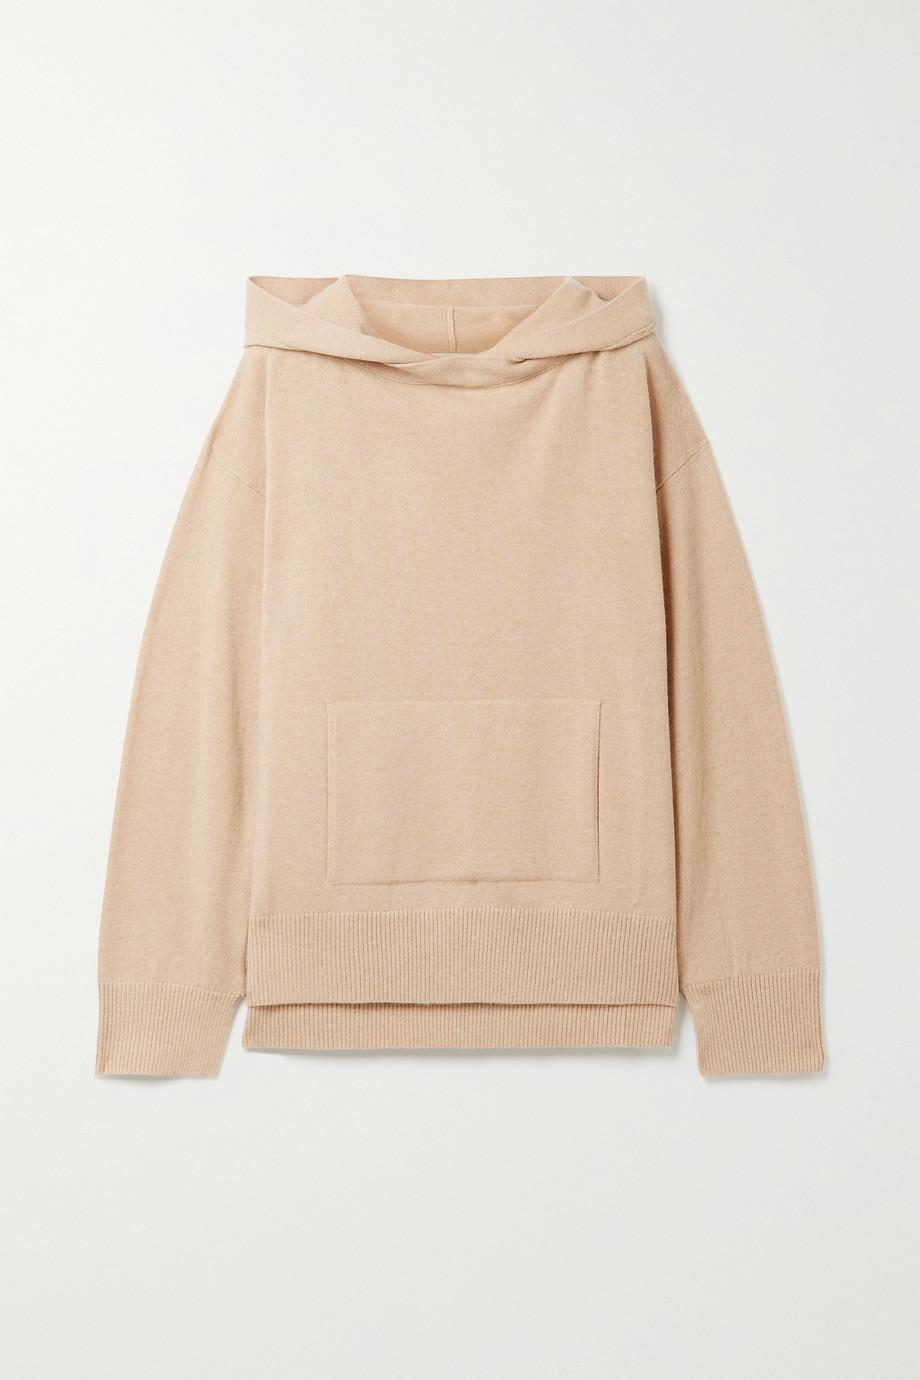 Rosetta Getty Cashmere hoodie